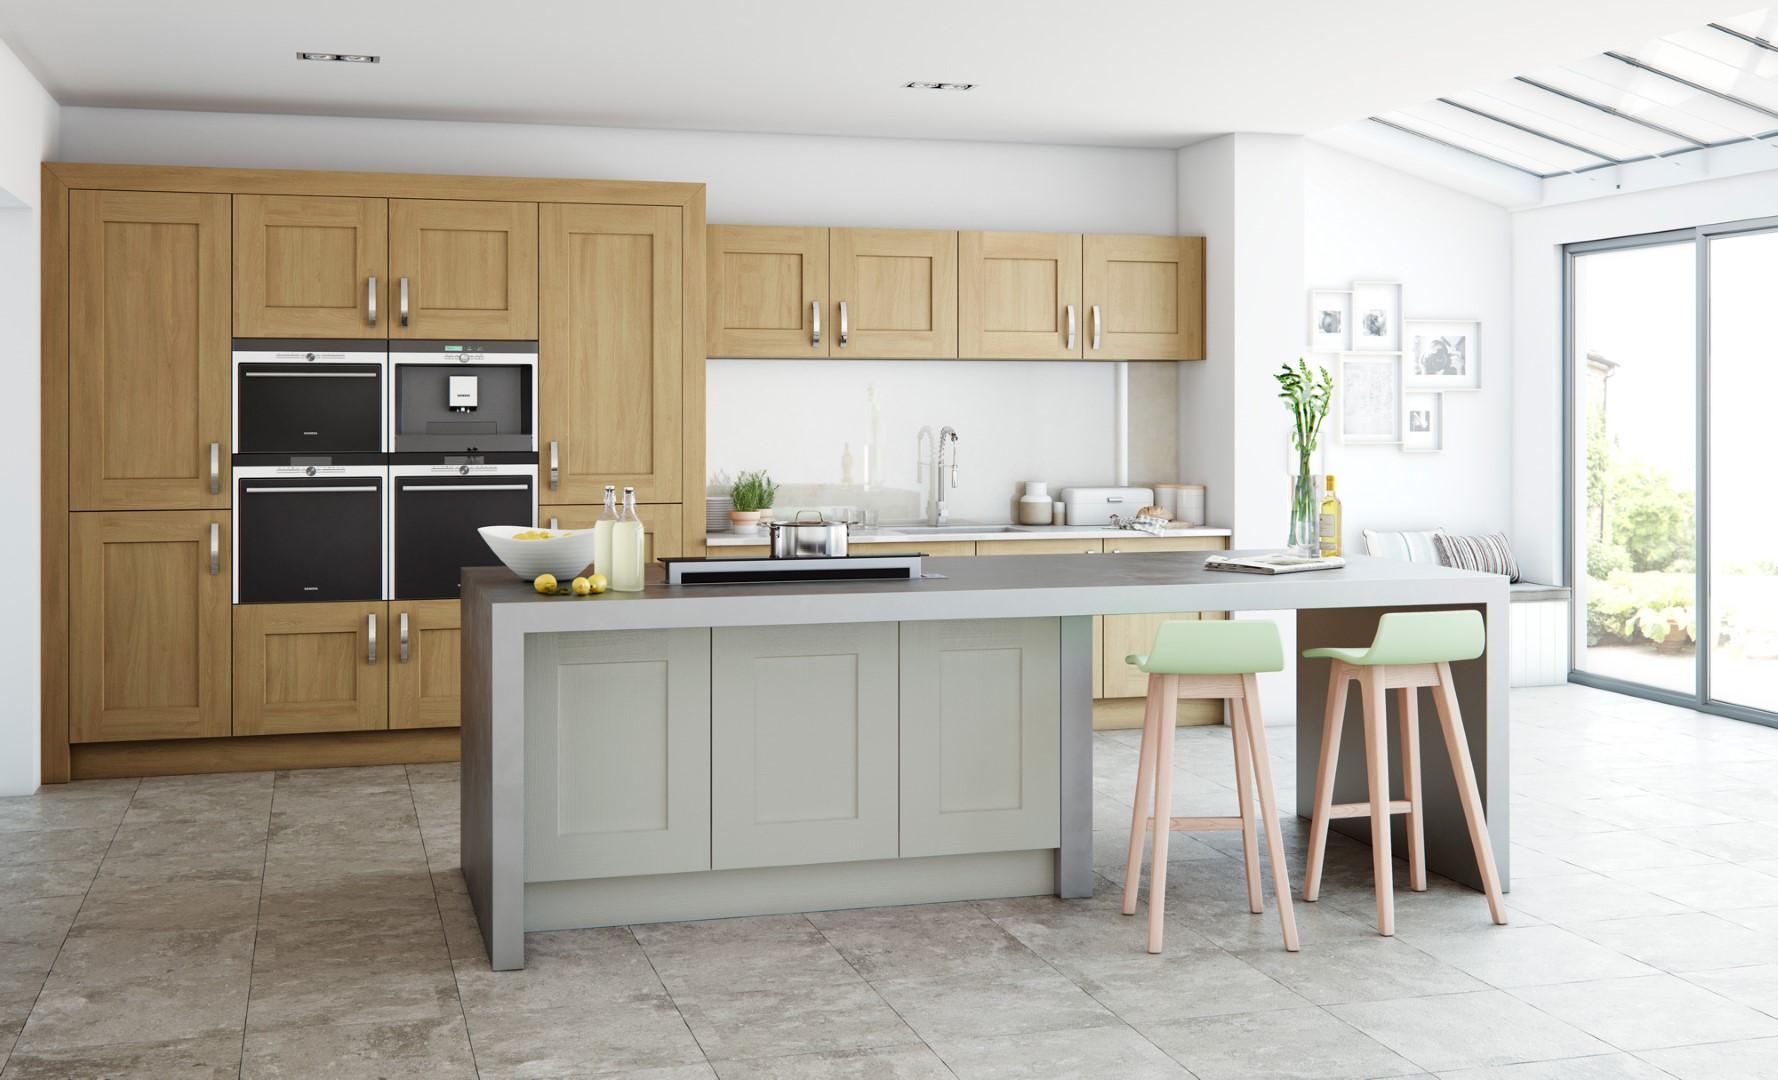 Modern Contemporary Classic Kitchen - Clonmel Oak, Painted Stone Kitchen - Kitchen Design - Alan Kelly Kitchens - Waterford